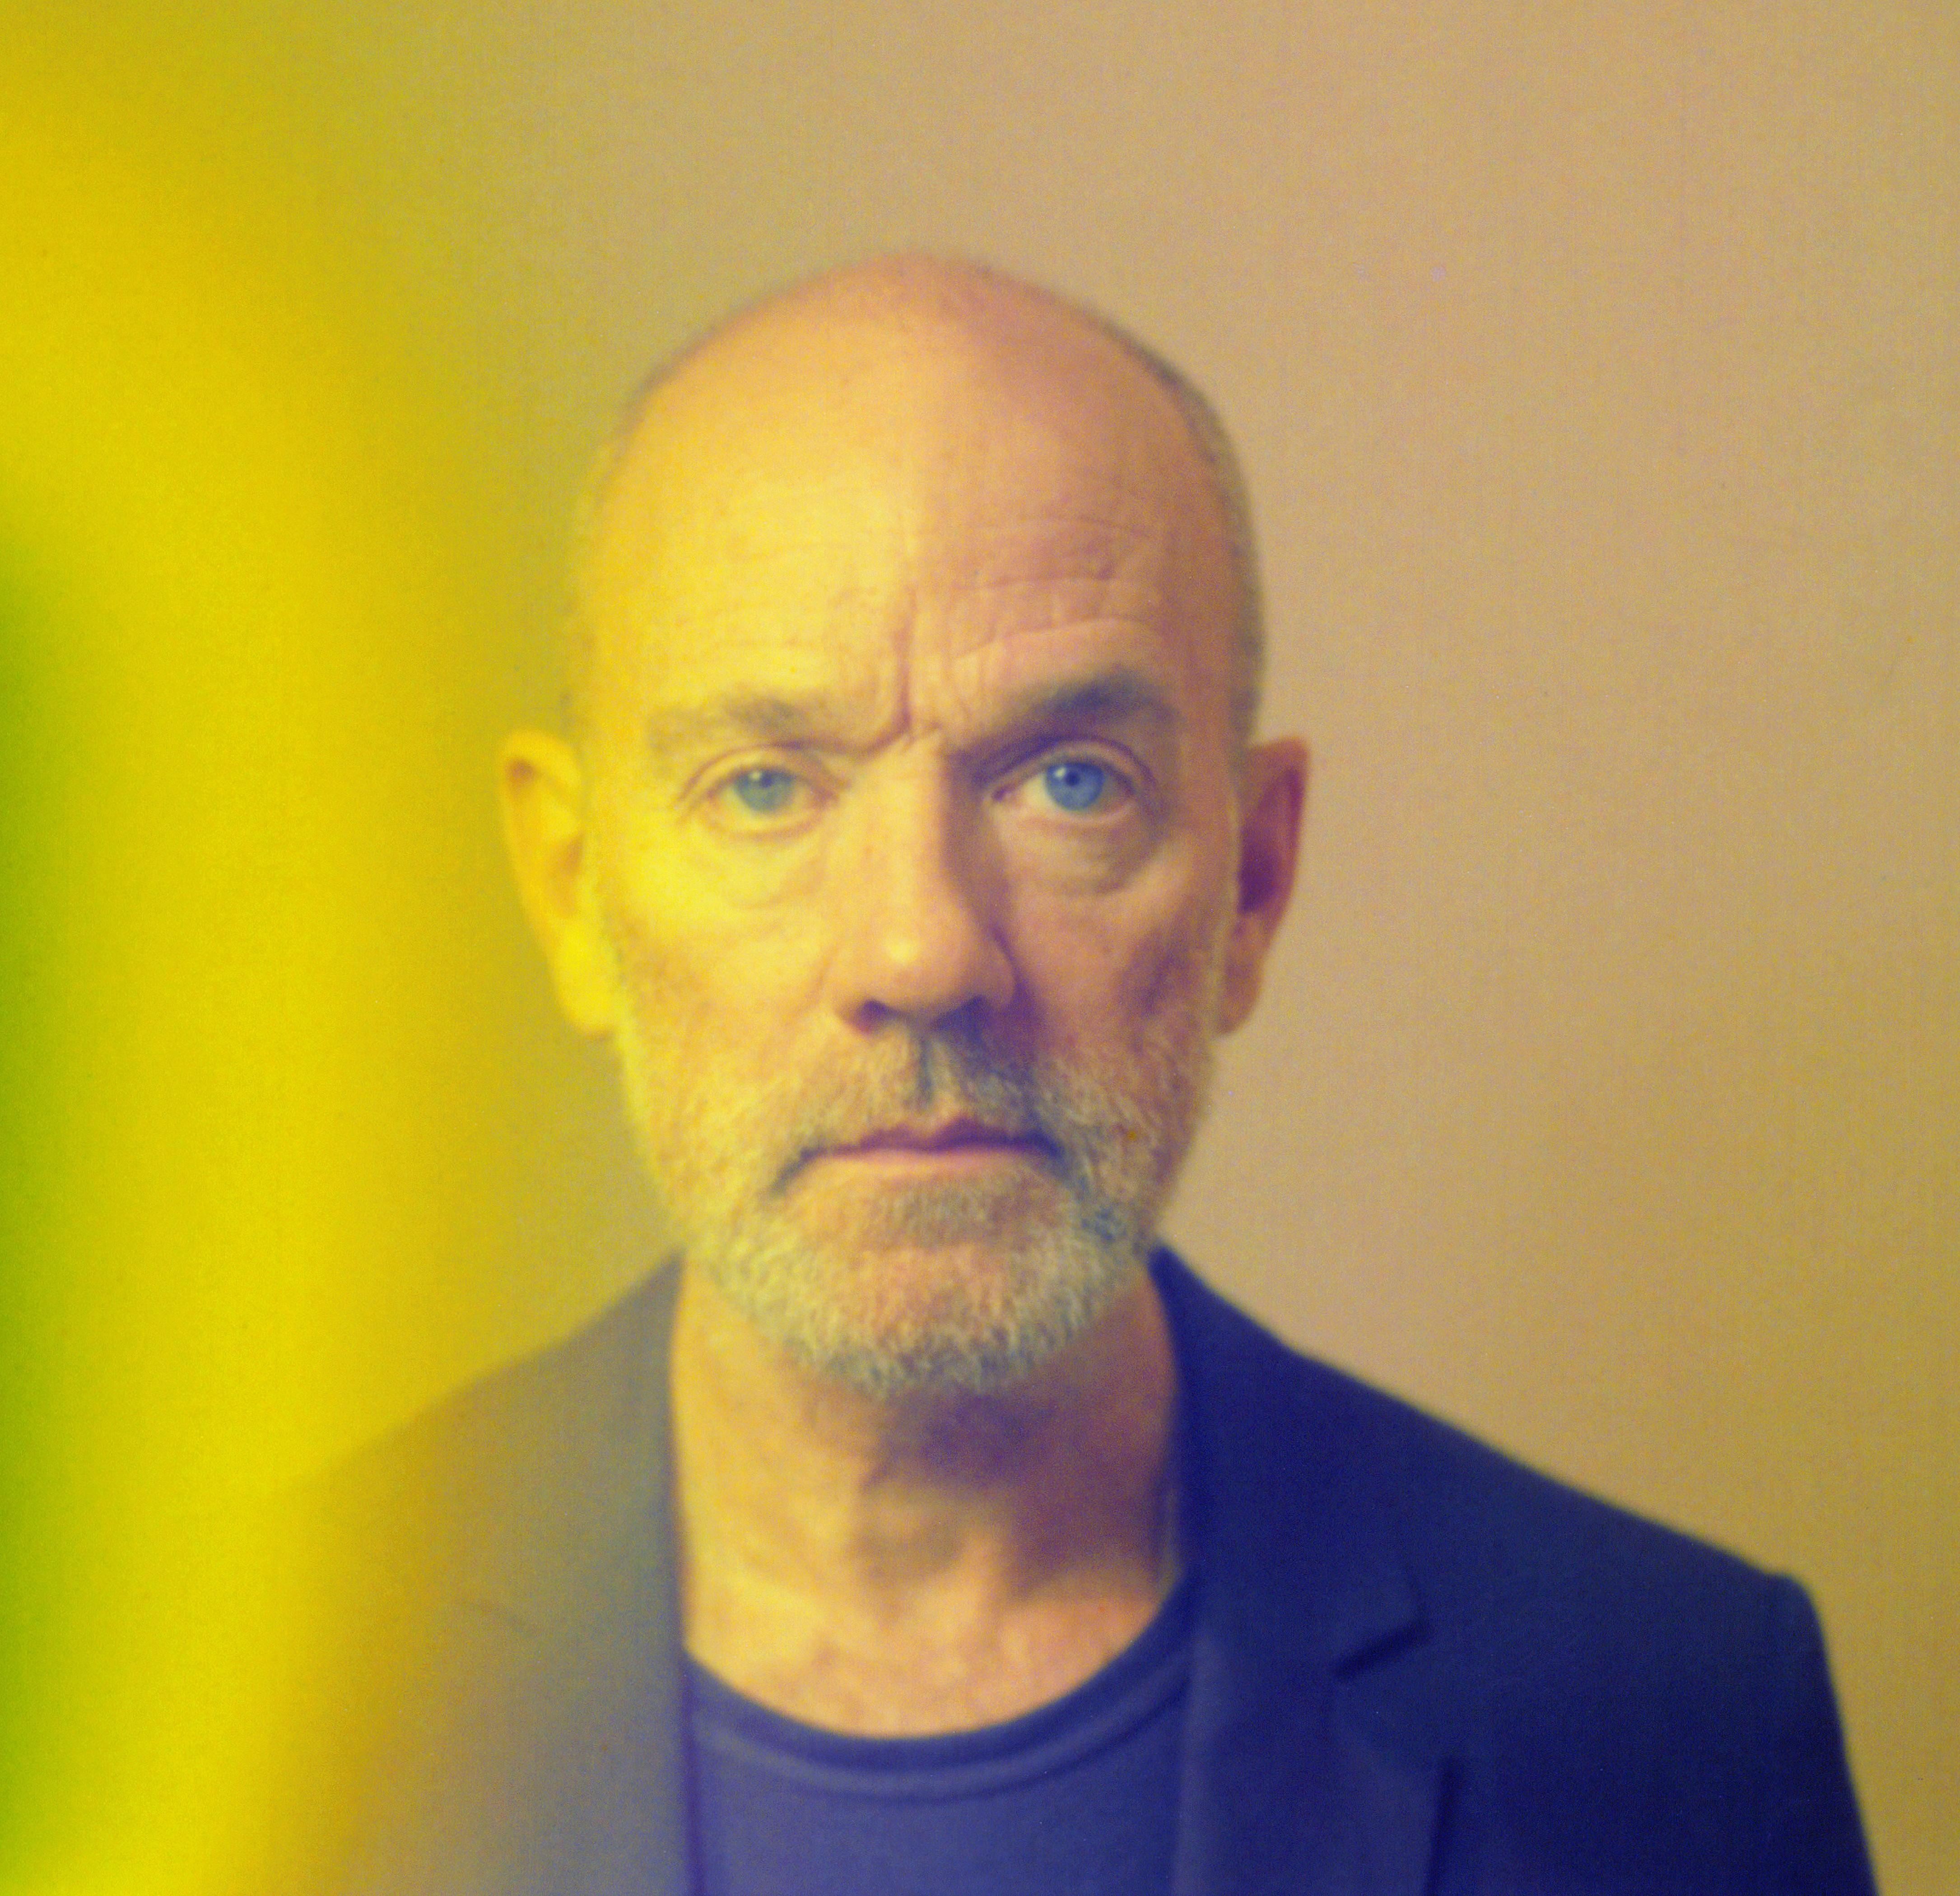 Michael Stipe self-portrait polaroid